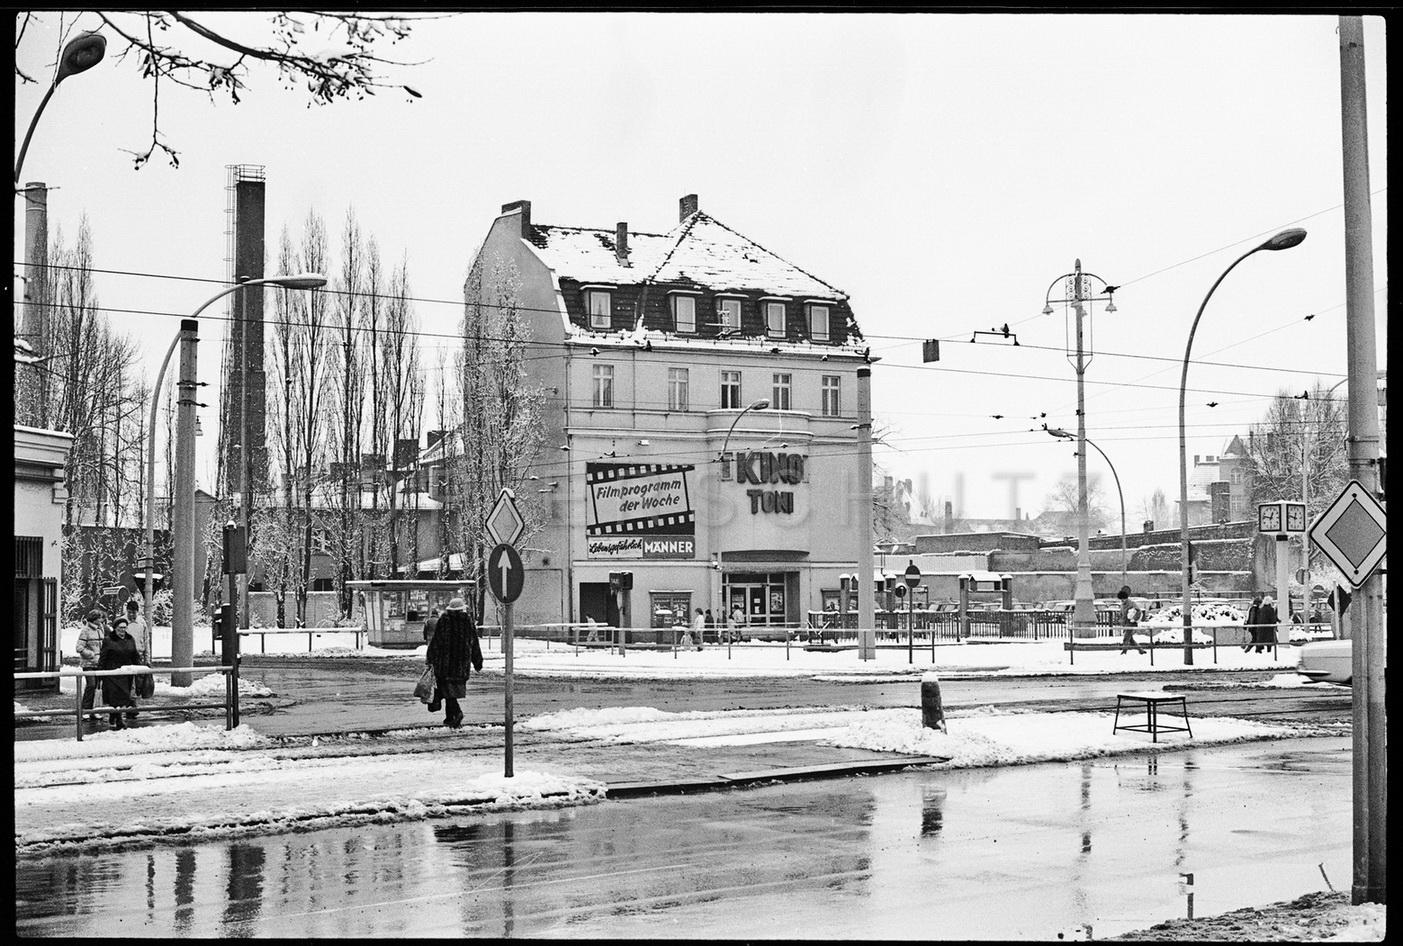 Nr01-008_Antonplatz-19.2.1987